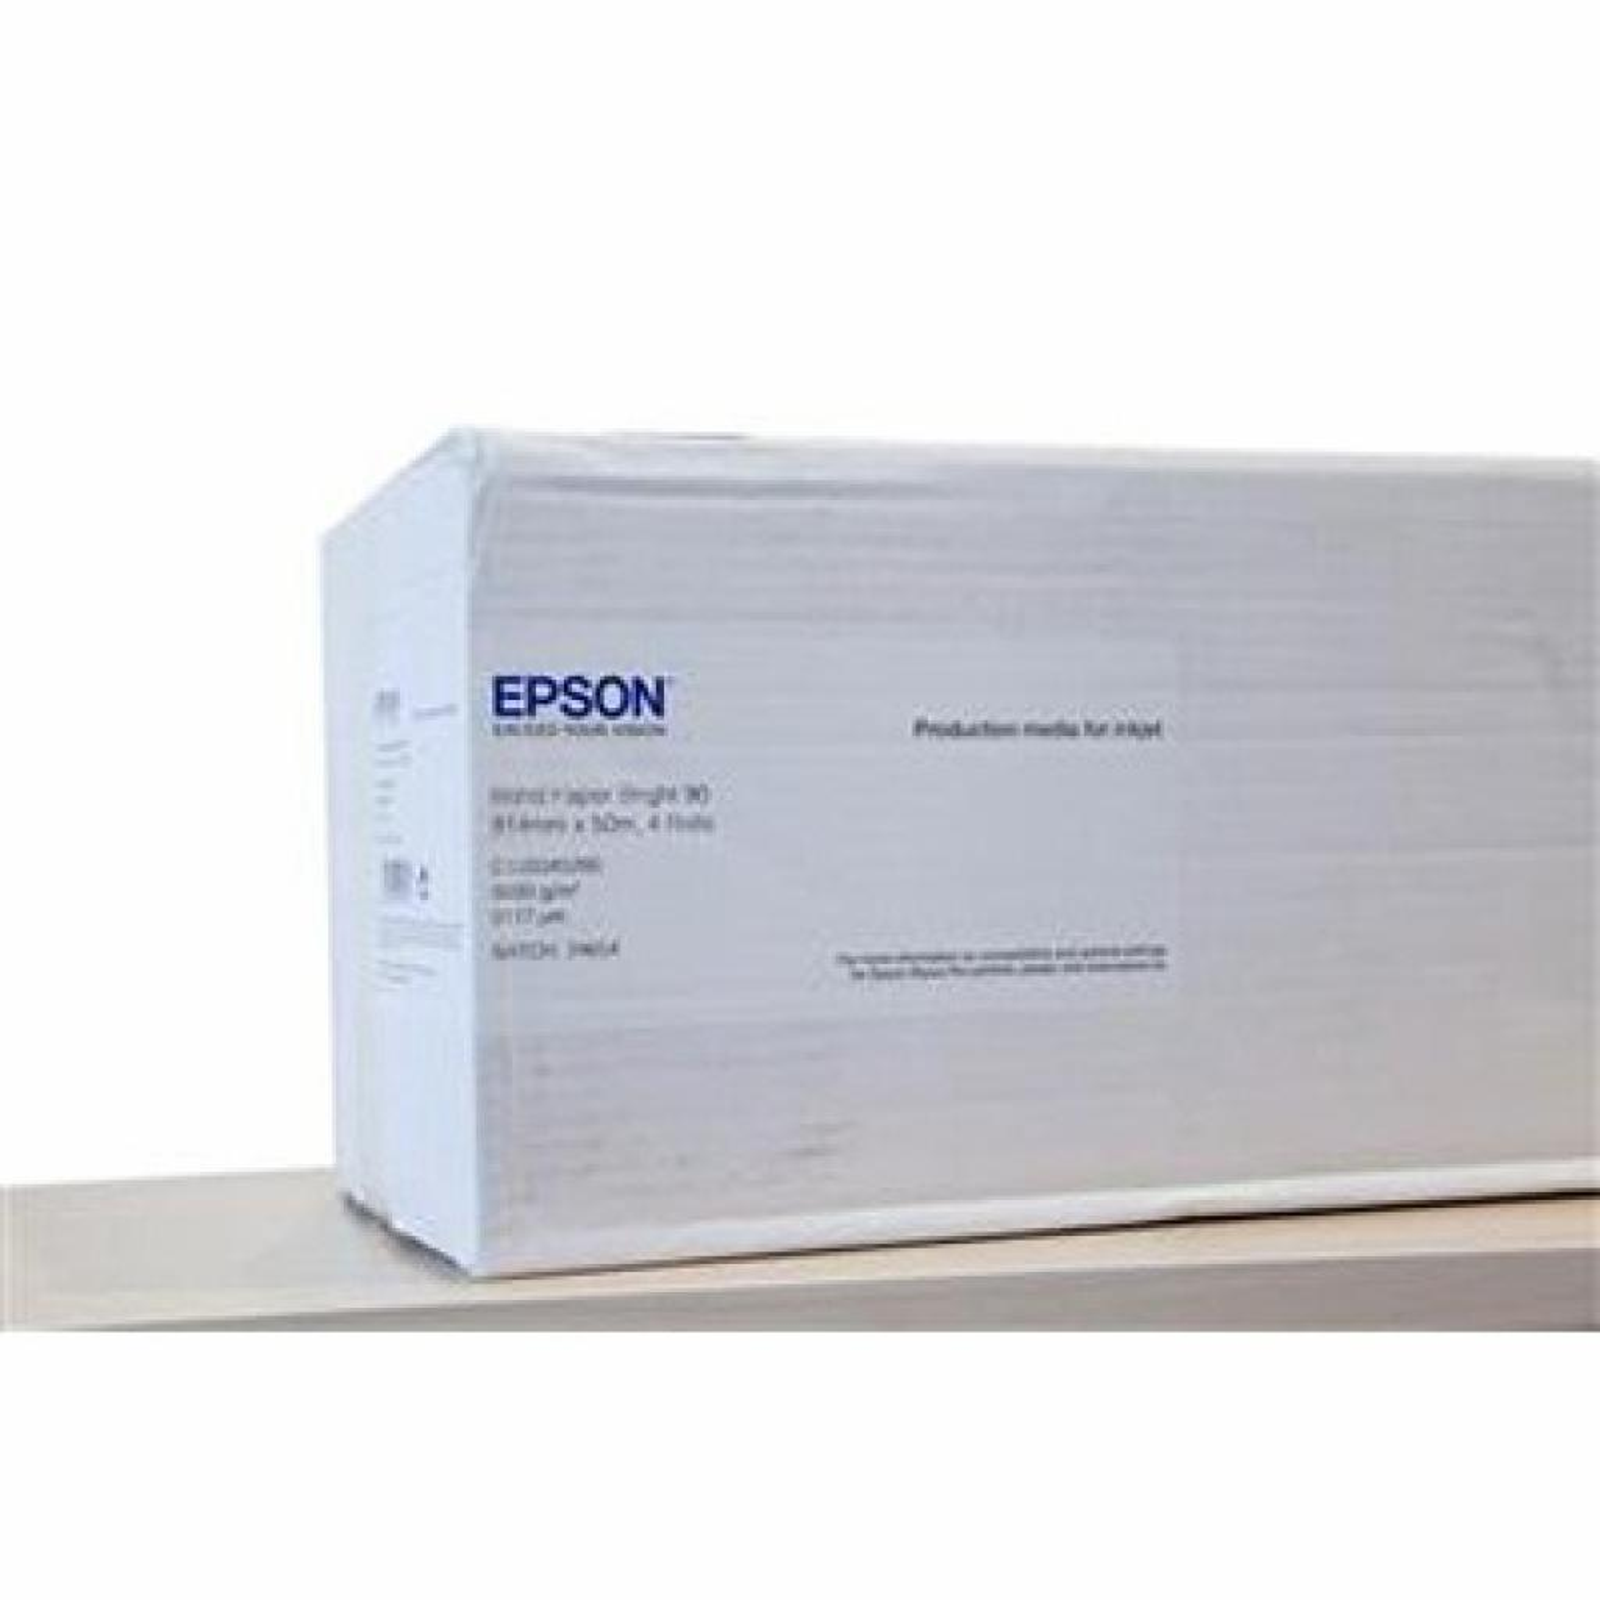 "Бумага EPSON 42"" Bond Paper White (C13S045276)"